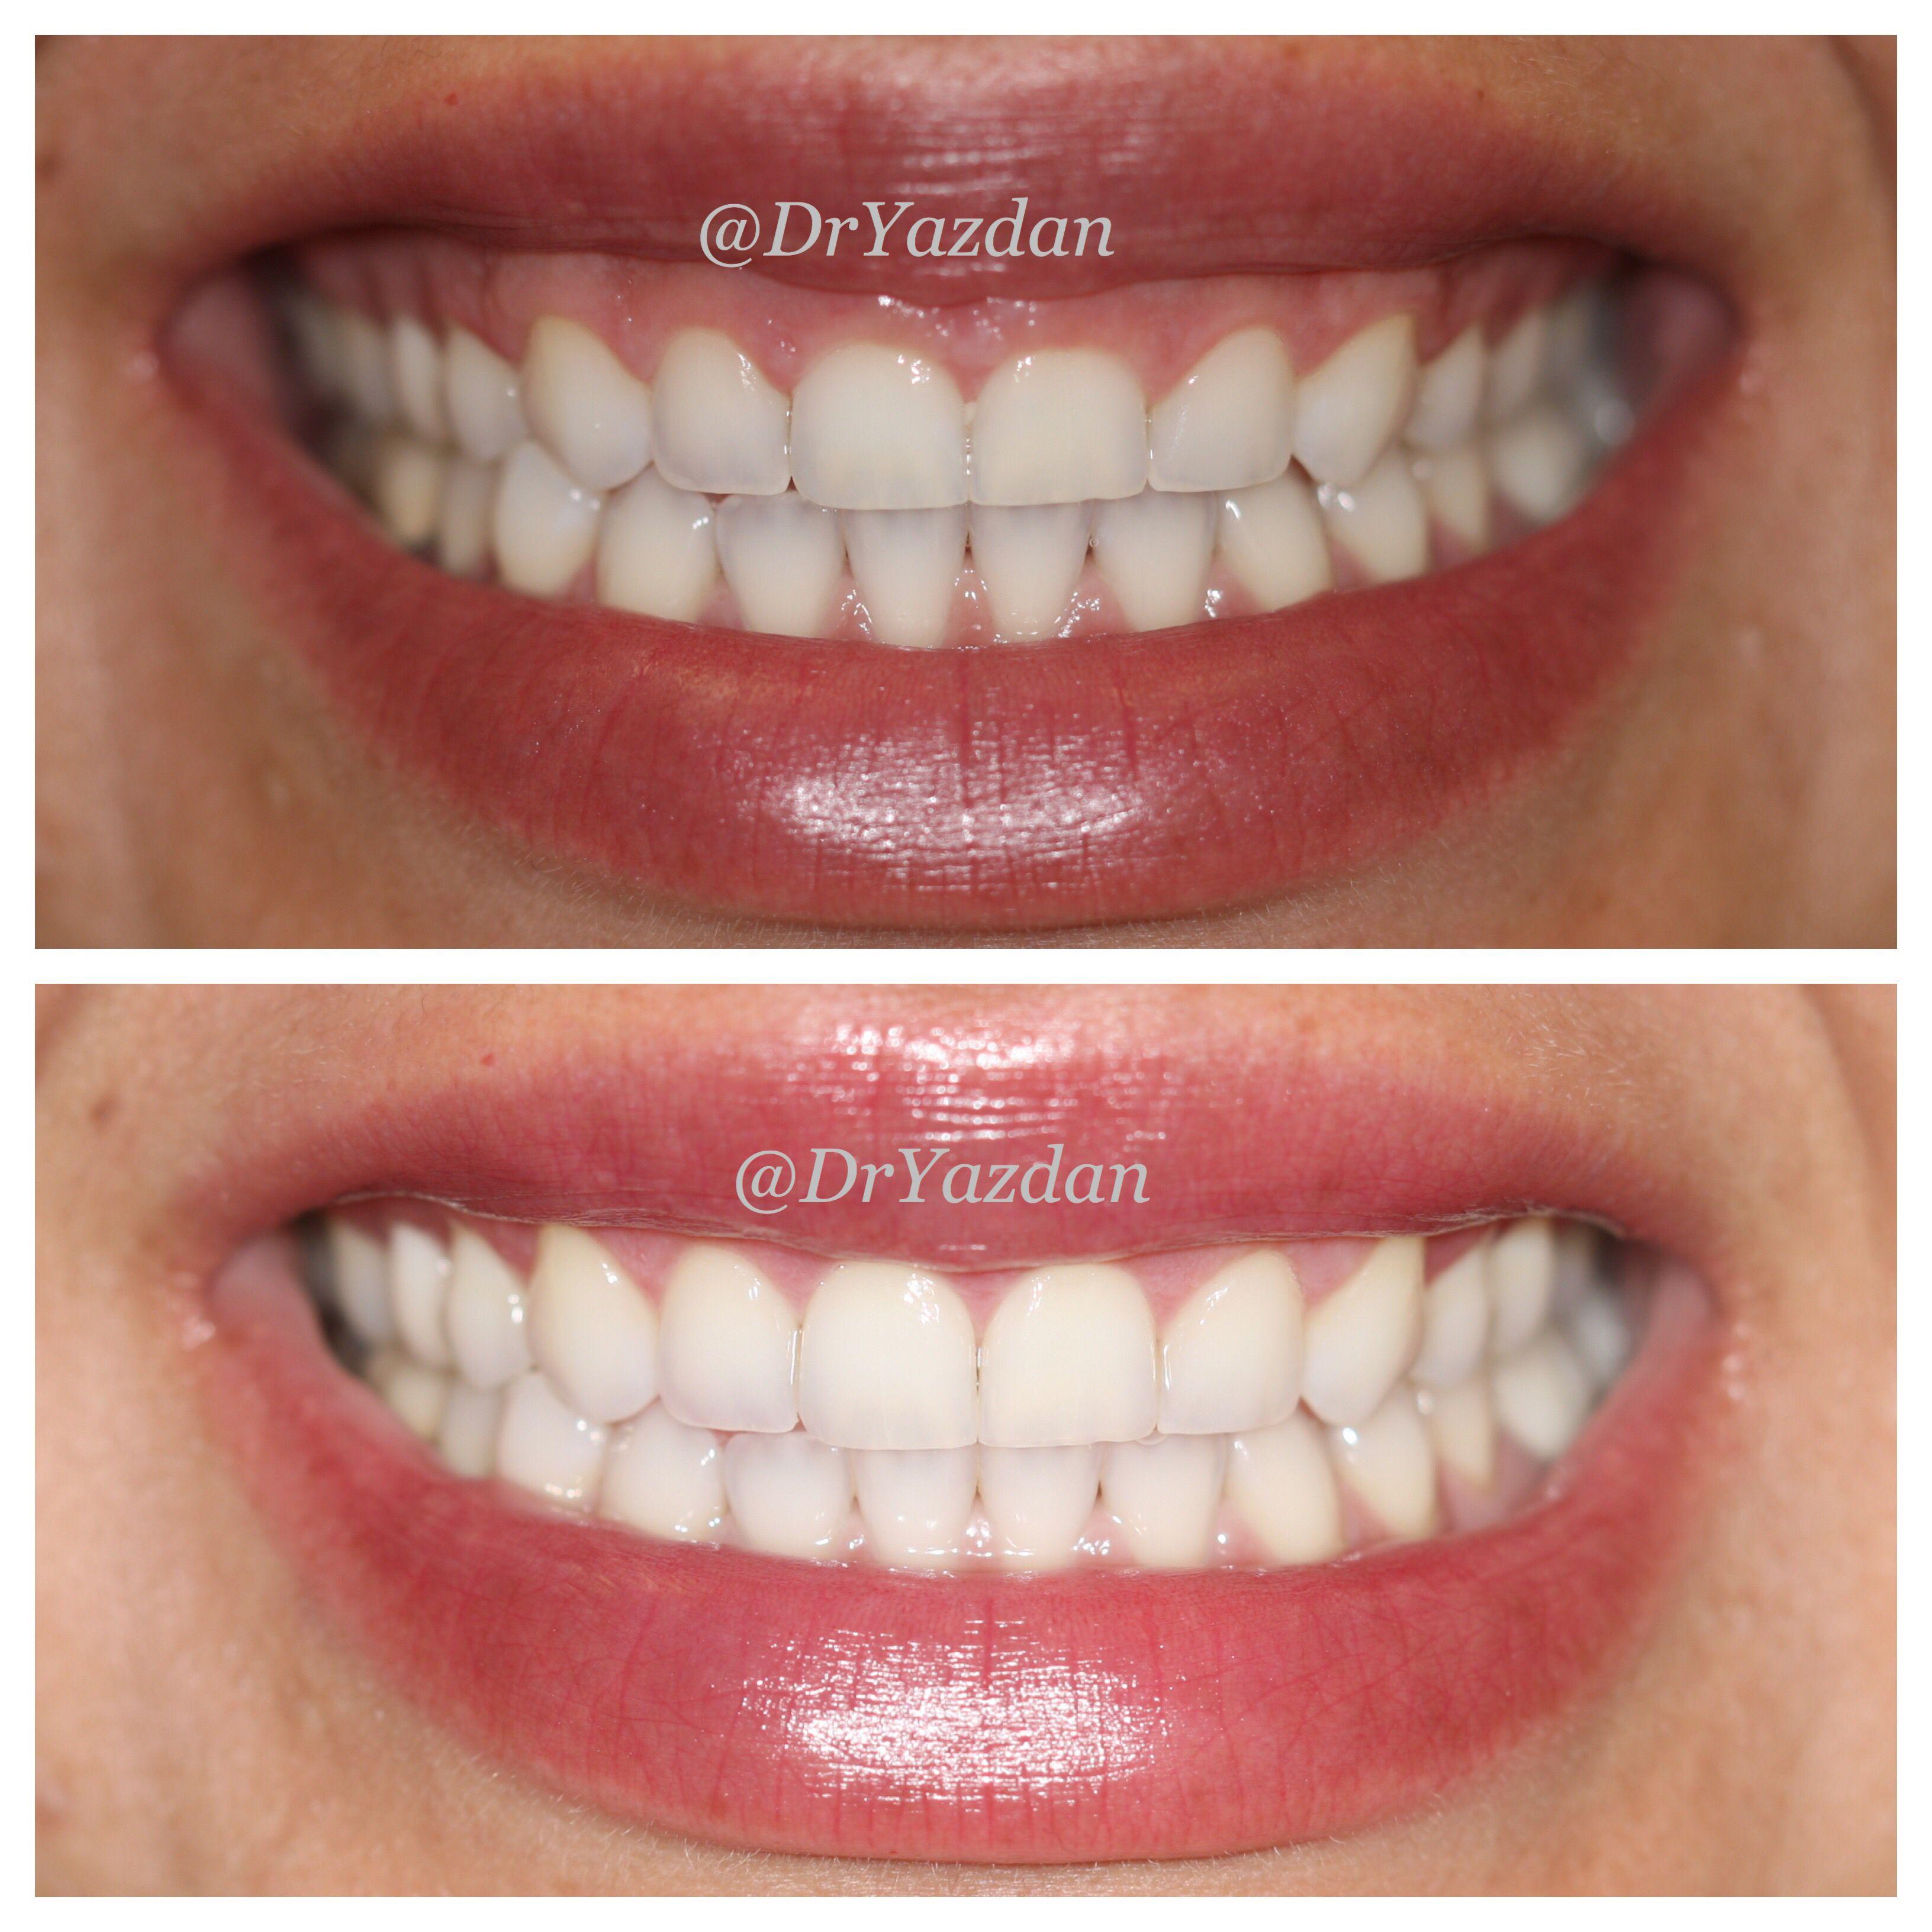 Aesthetic dentistry: modern methods for correcting dental defects